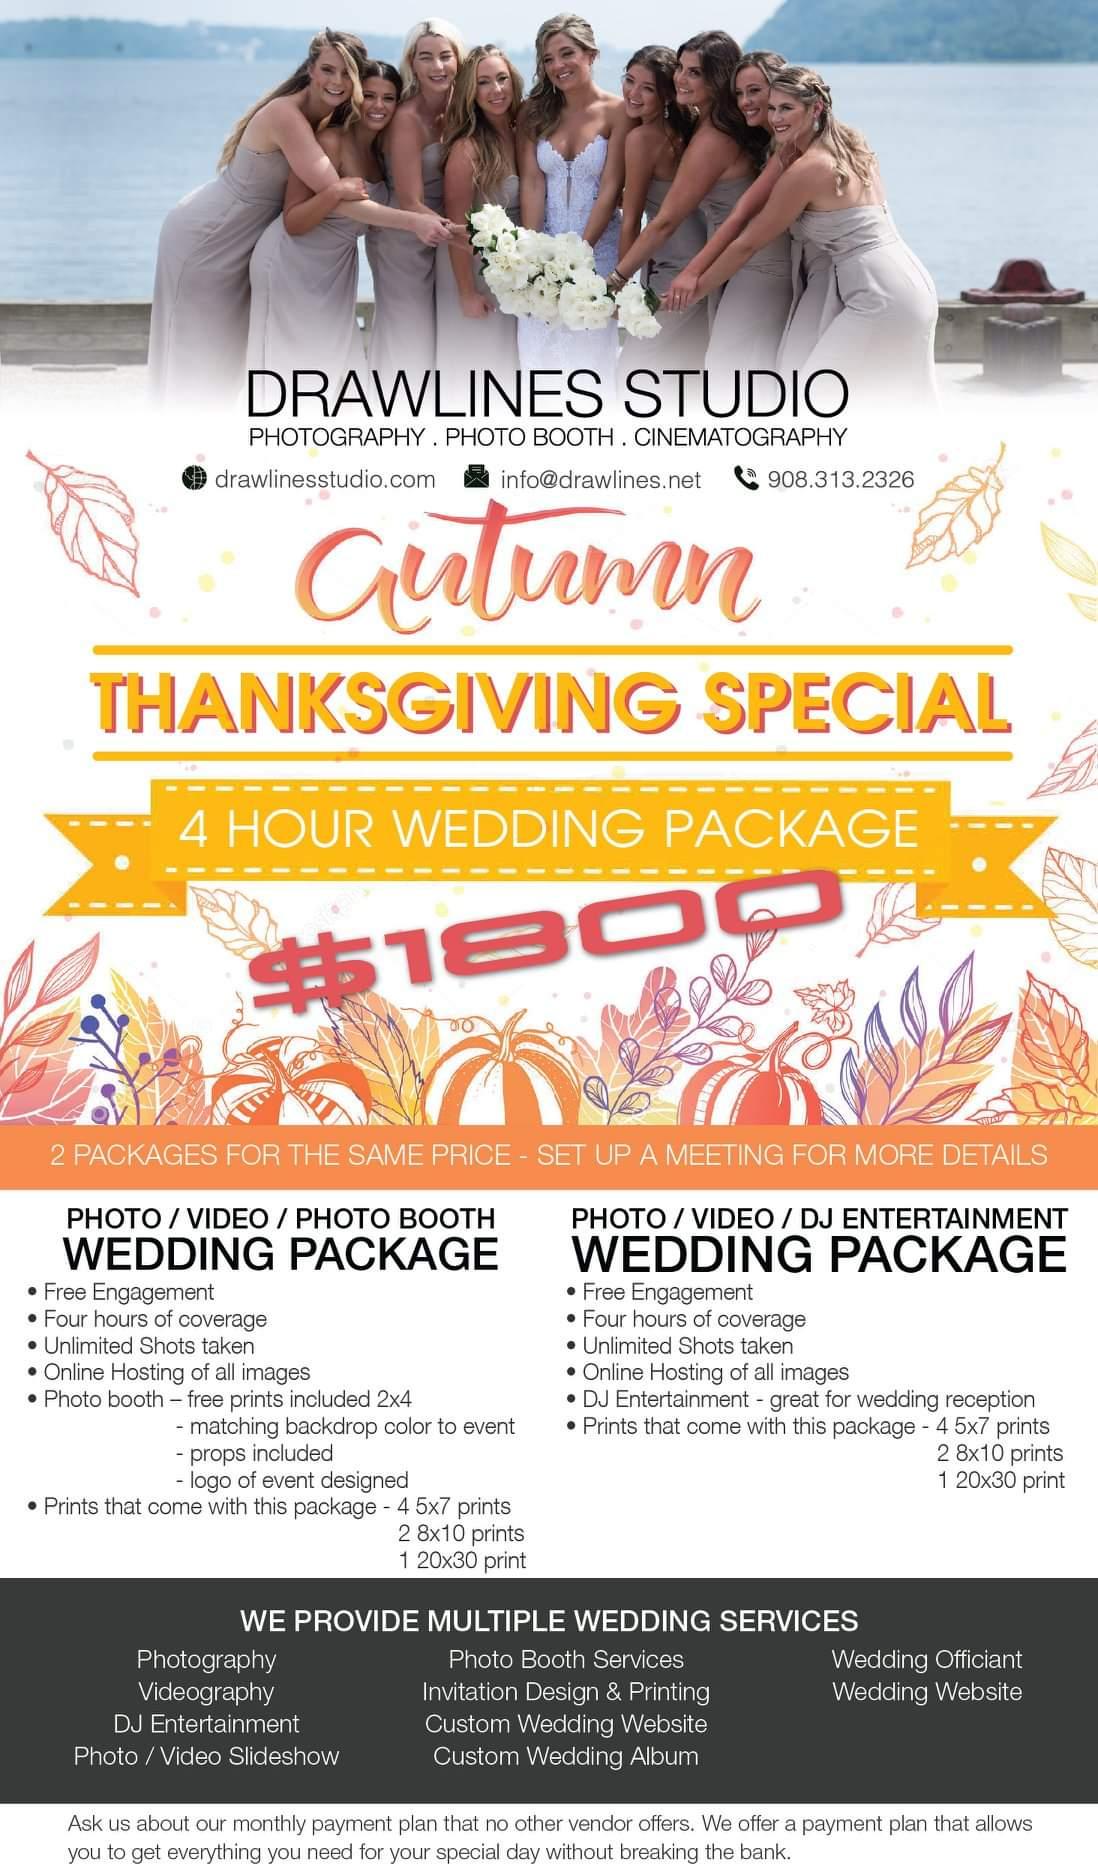 Drawlines Studio